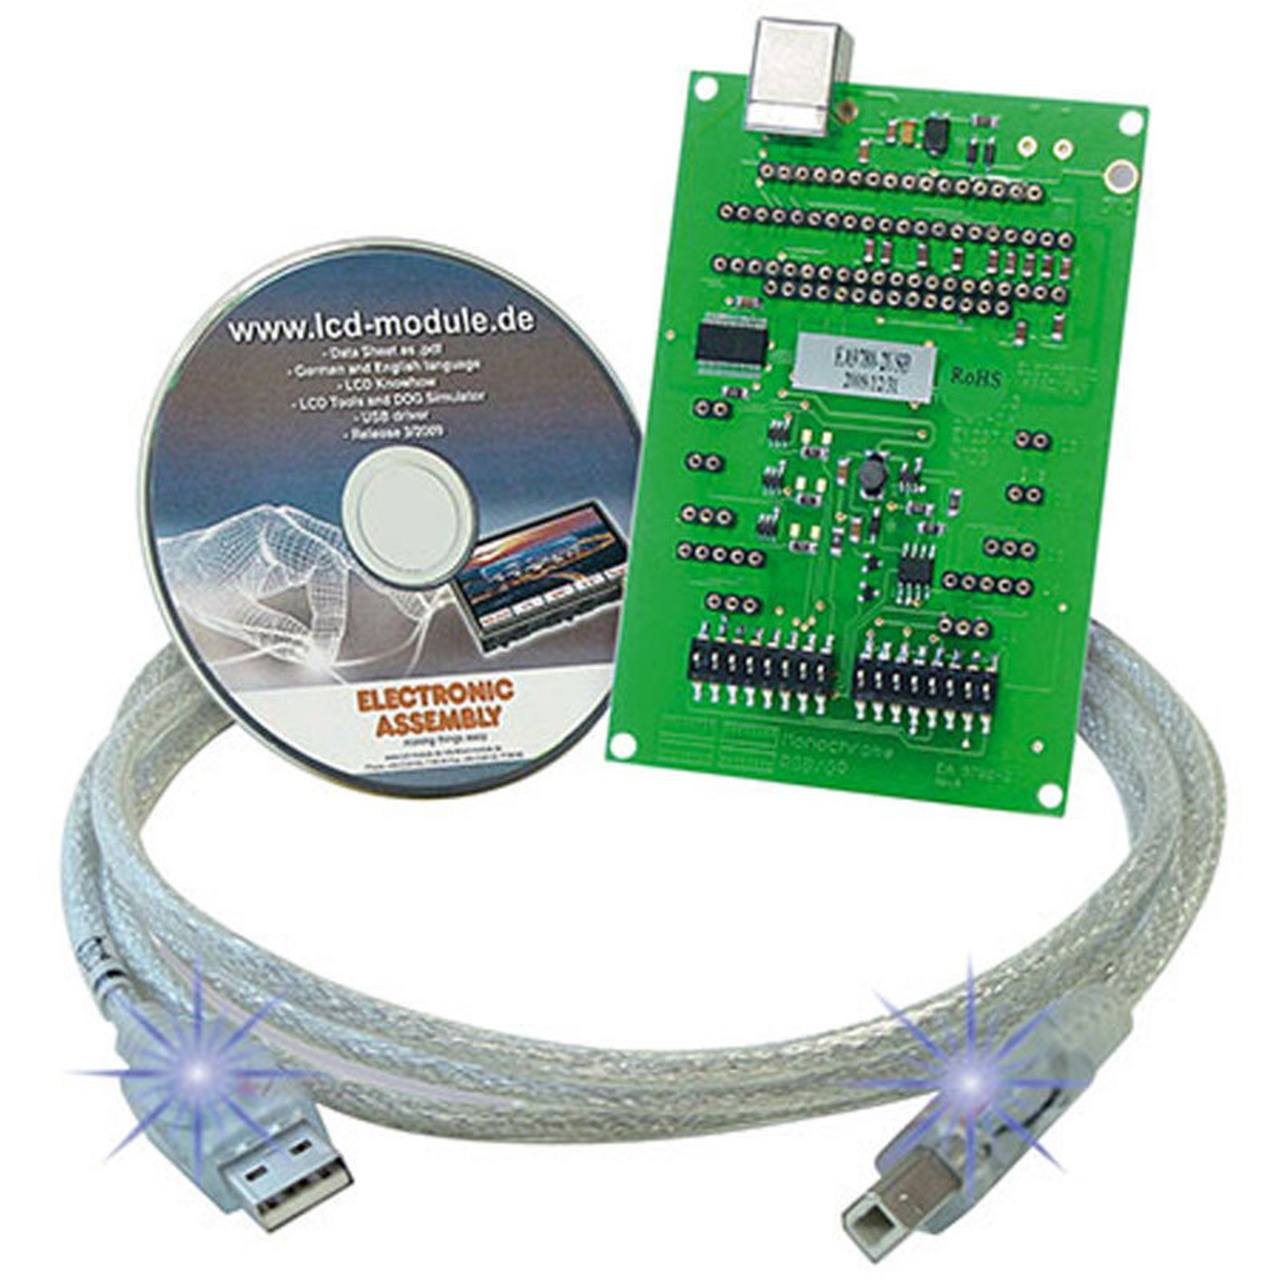 Electronic Assembly USB-Testboard EA 9780-2USB